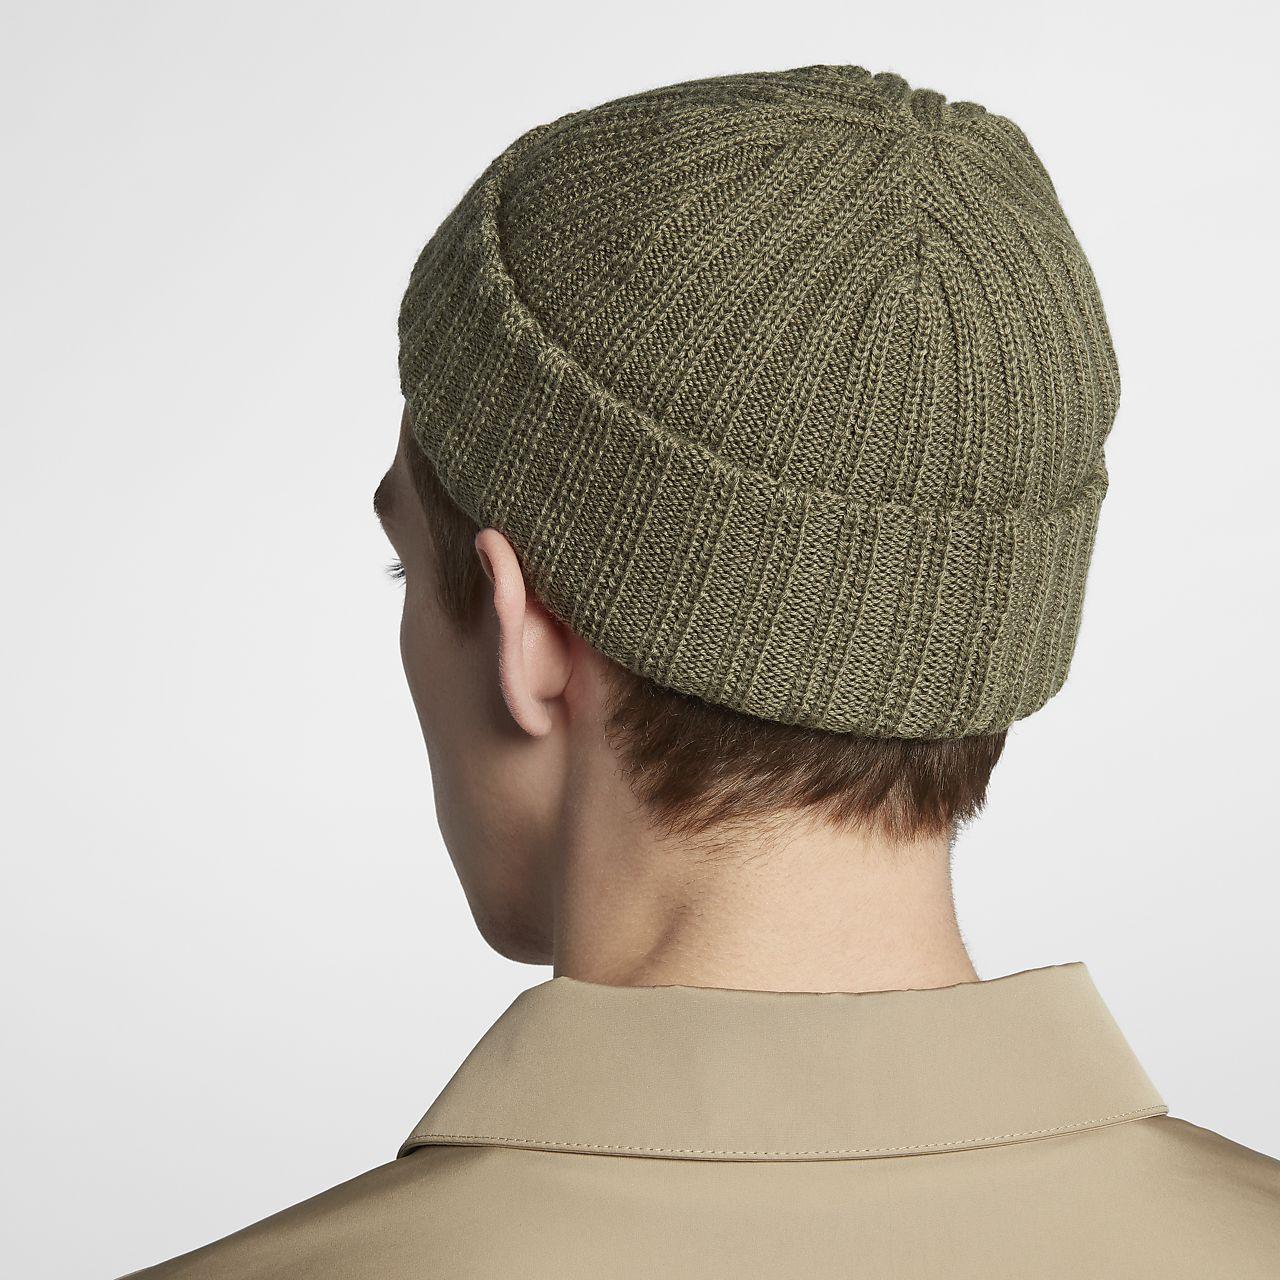 028b93aa820 NikeLab Collection Beanie Unisex Knit Hat. Nike.com MY